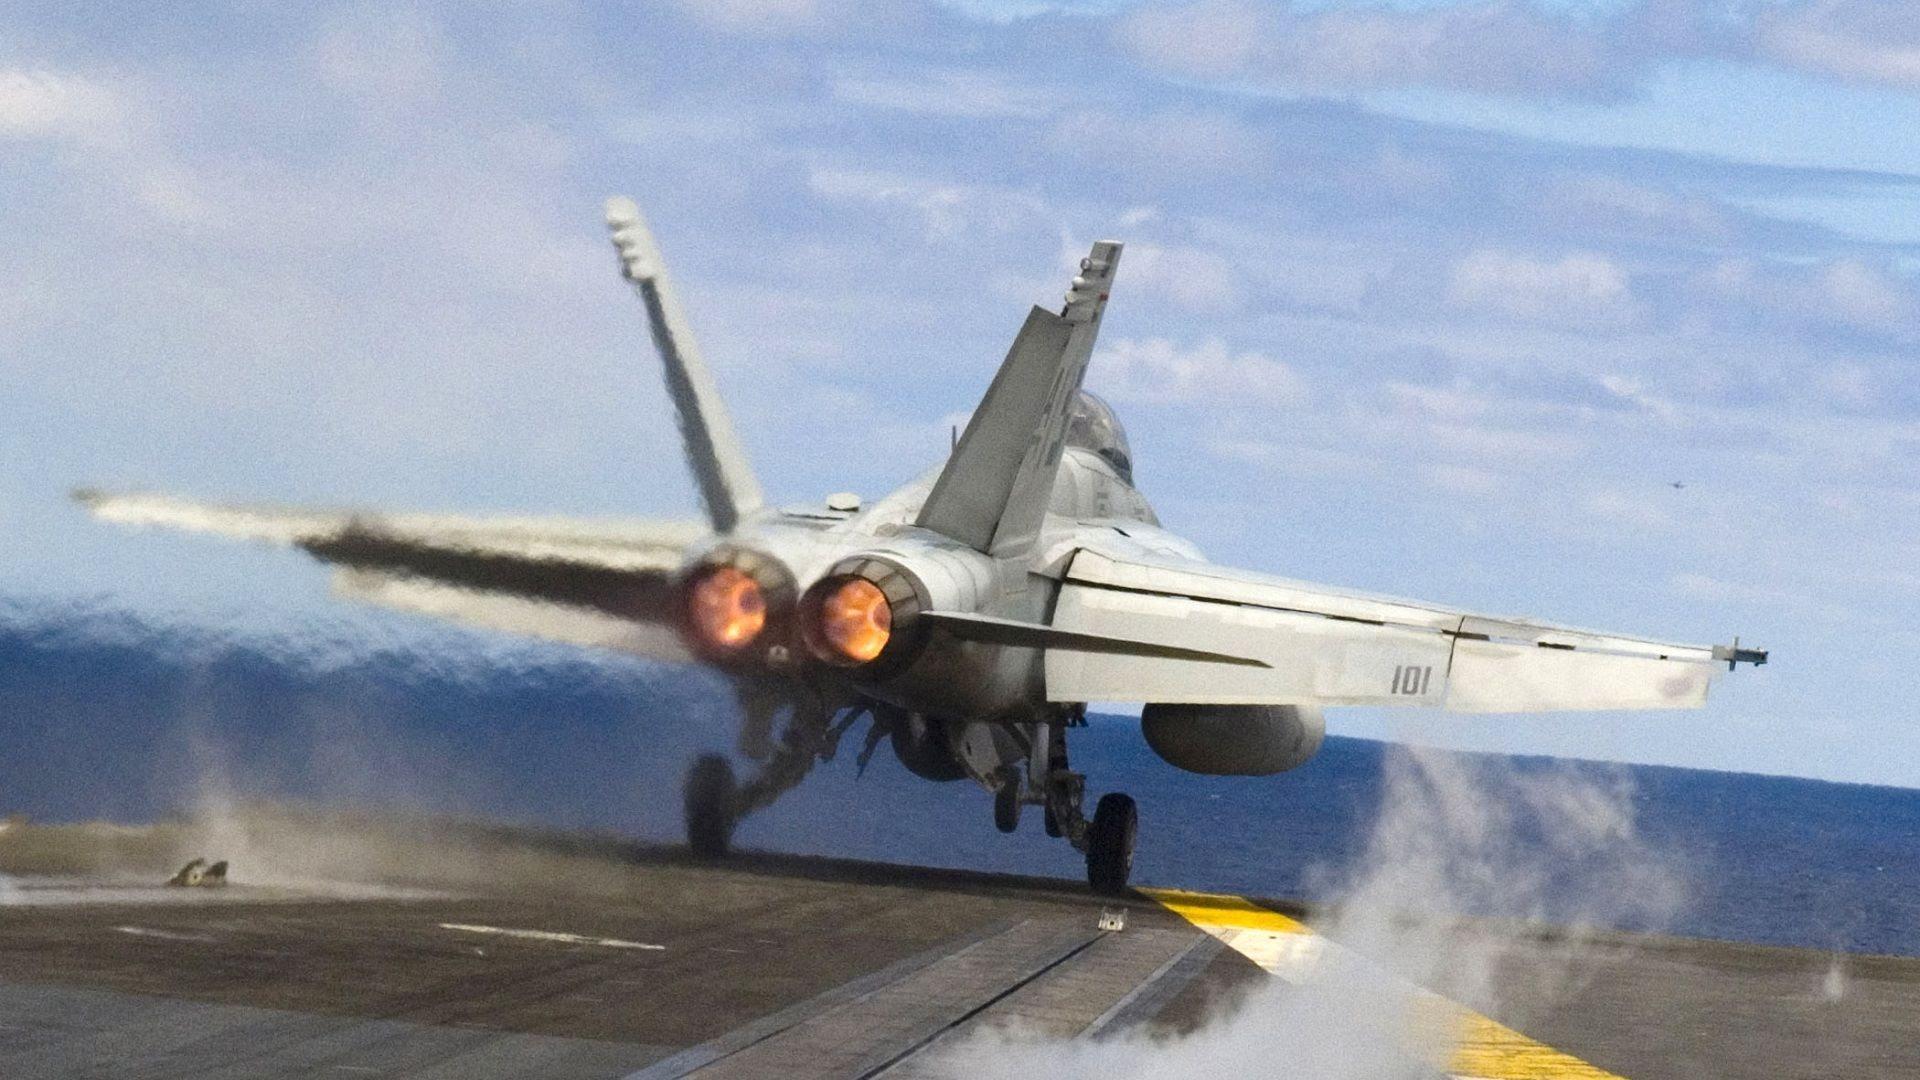 F A 18 Super Hornet Wallpaper Sf Wallpaper